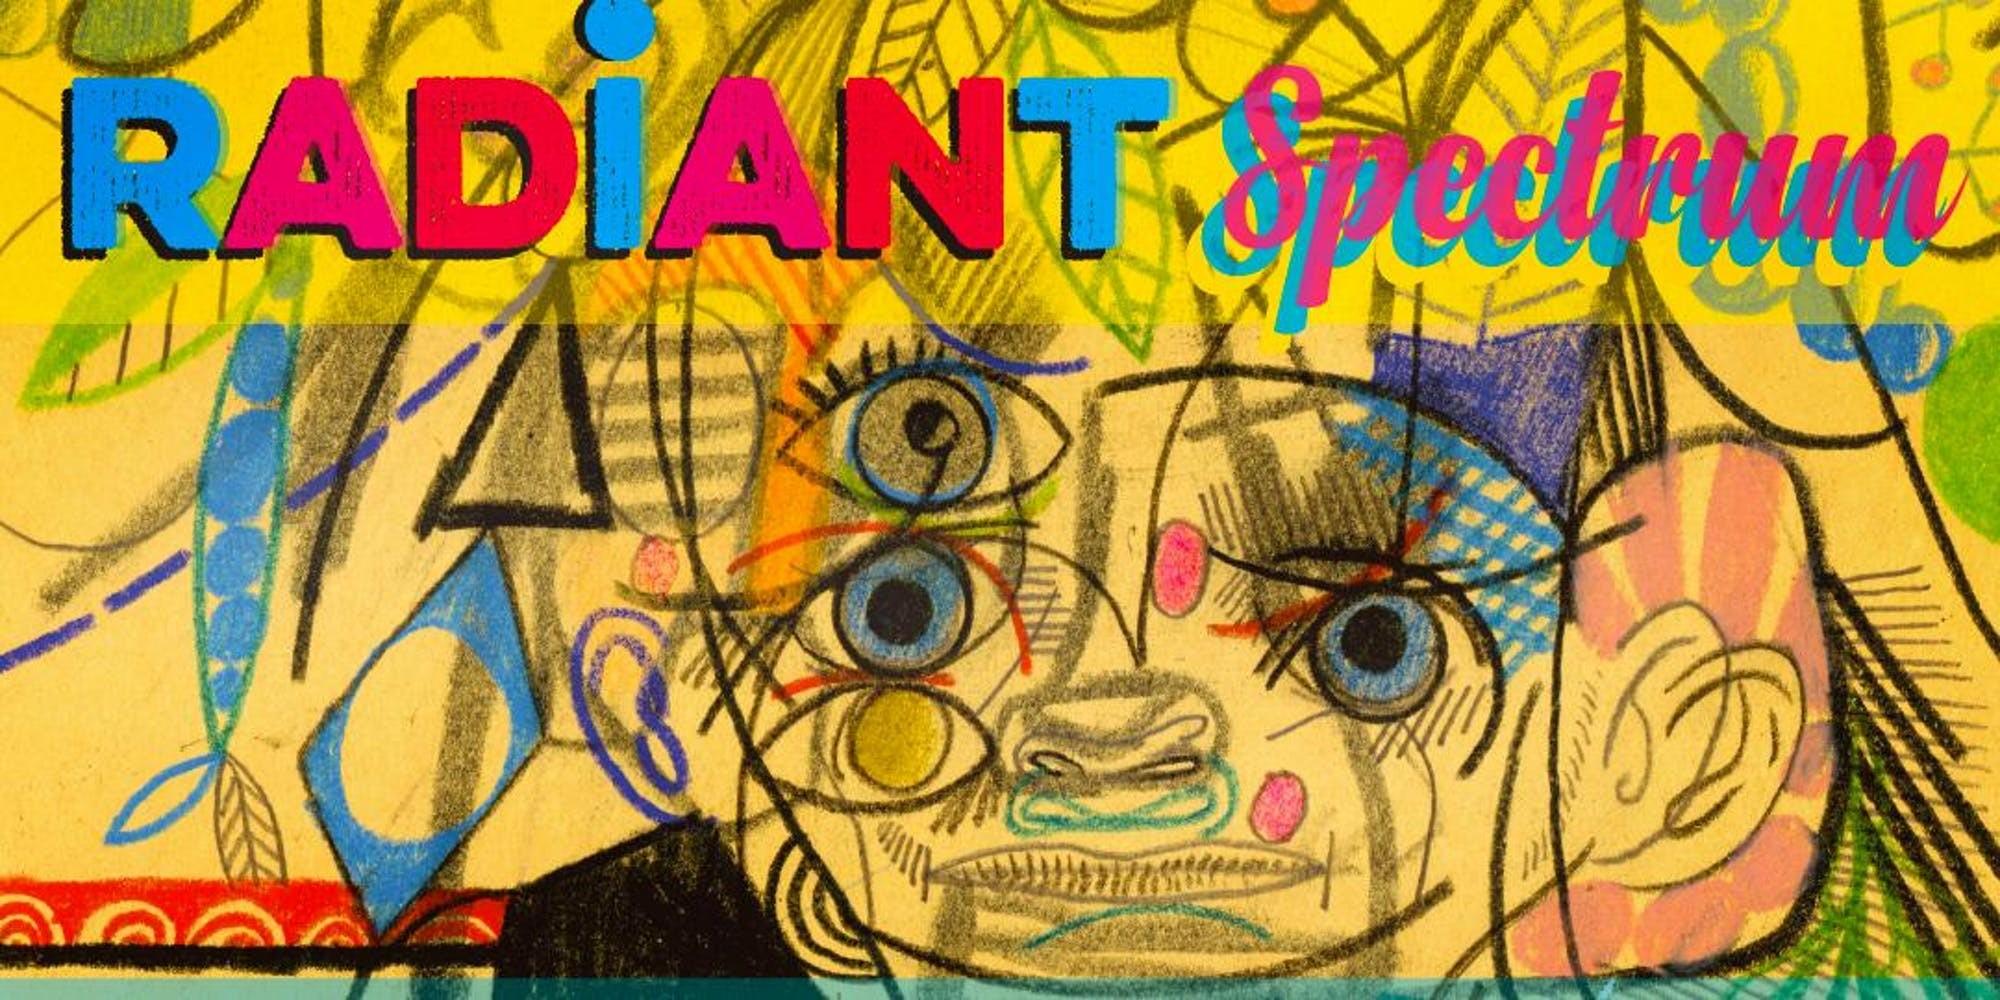 Radiant Spectrum Art Exhibit Event Mash Gallery Los Angeles [9 March]